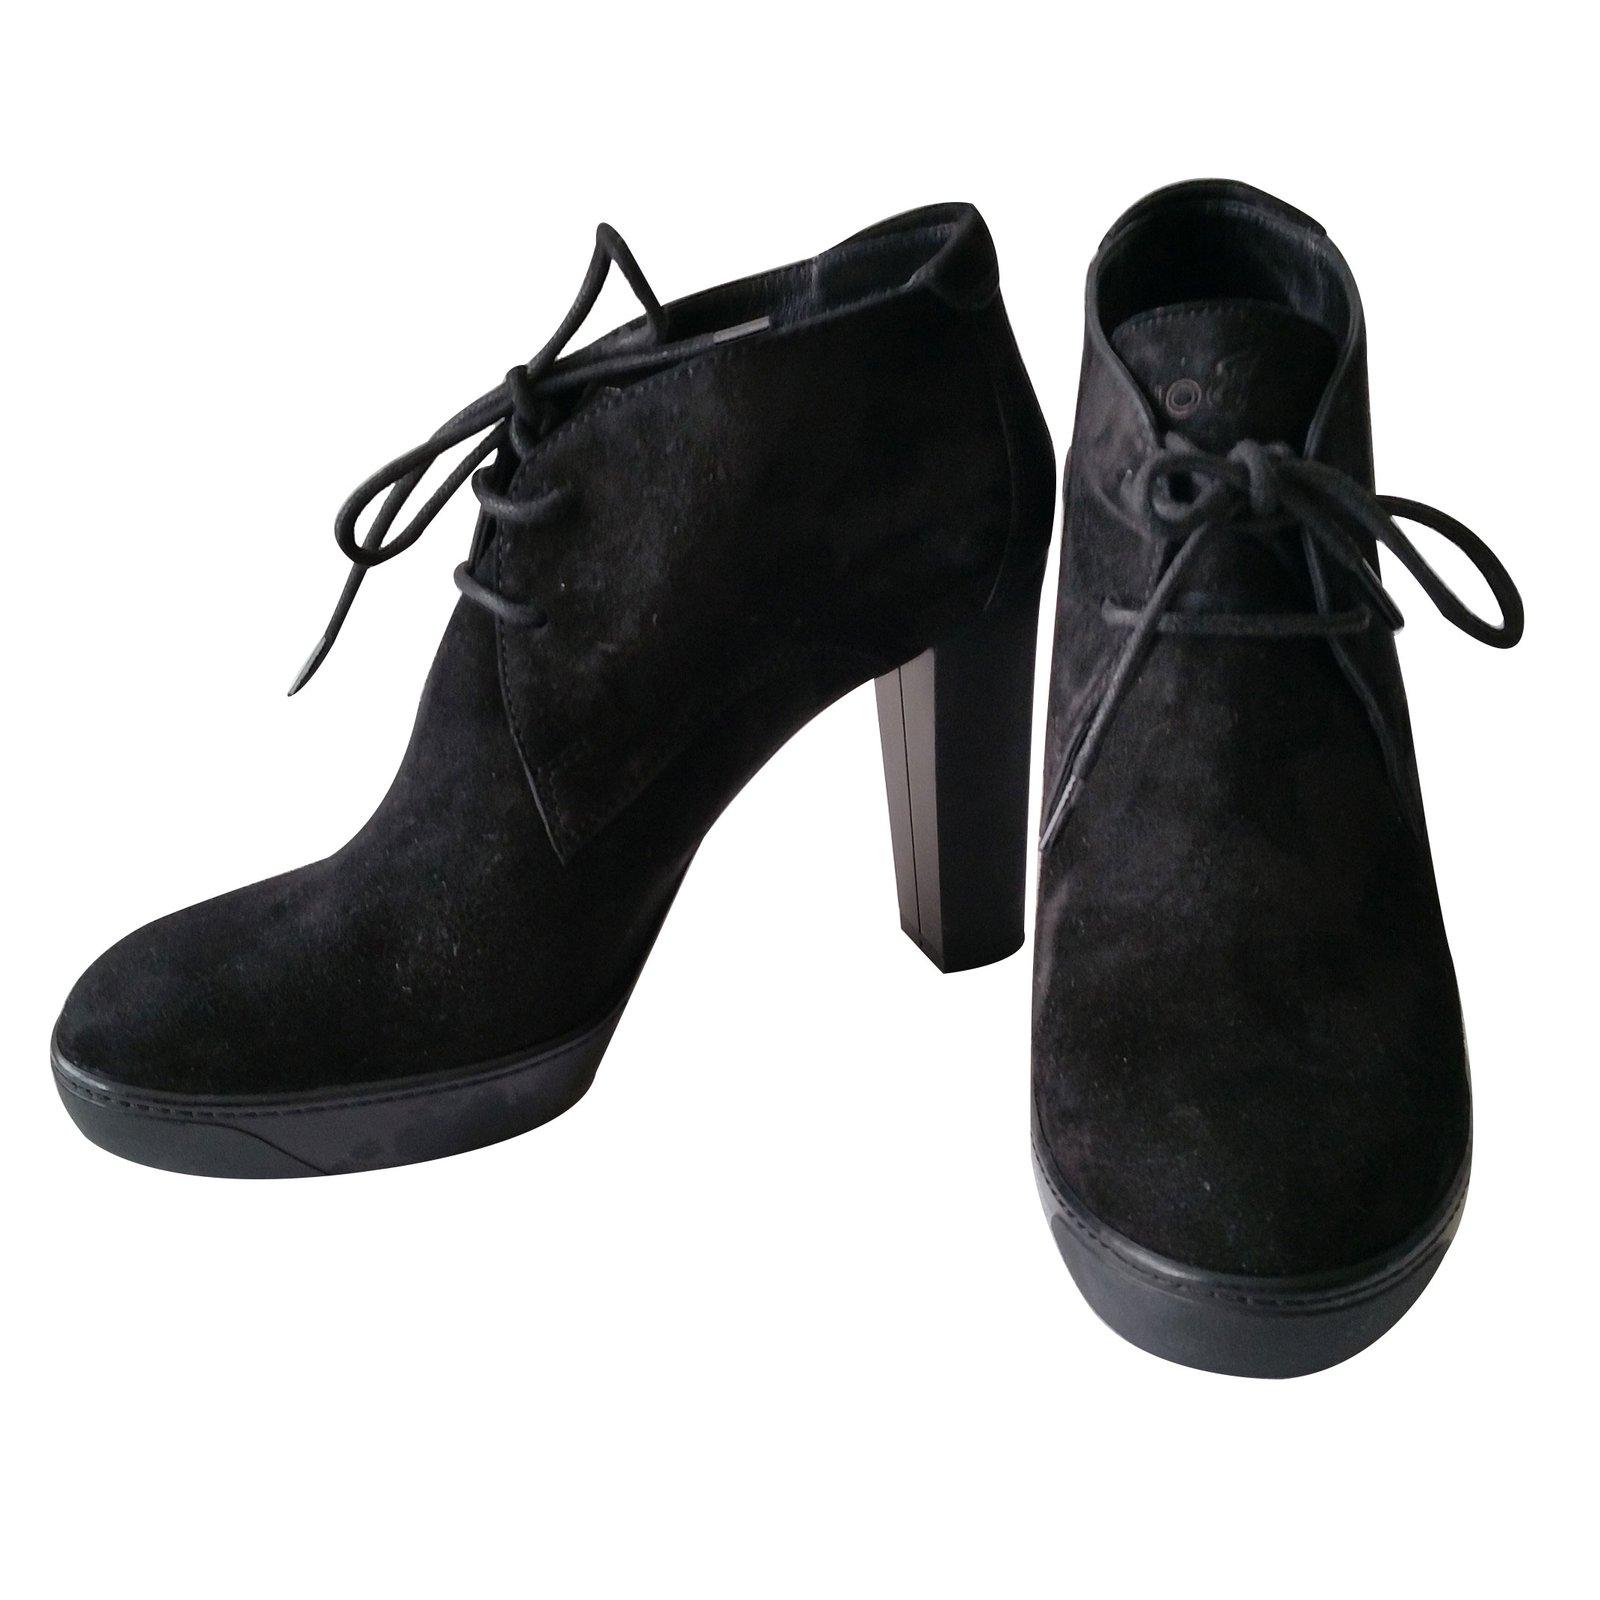 Hogan Ankle Boots Ankle Boots Deerskin Black ref.11751 - Joli Closet